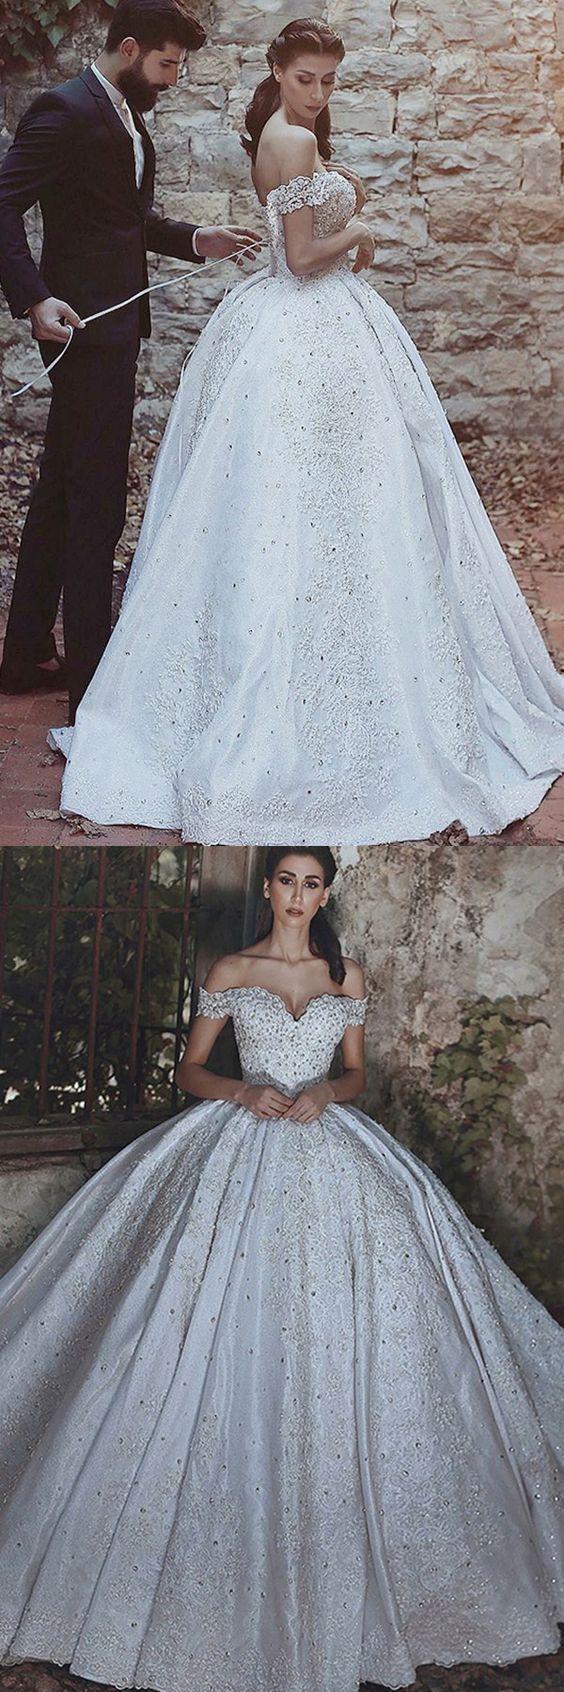 12568 best wedding dress | vestido de noiva images on Pinterest ...